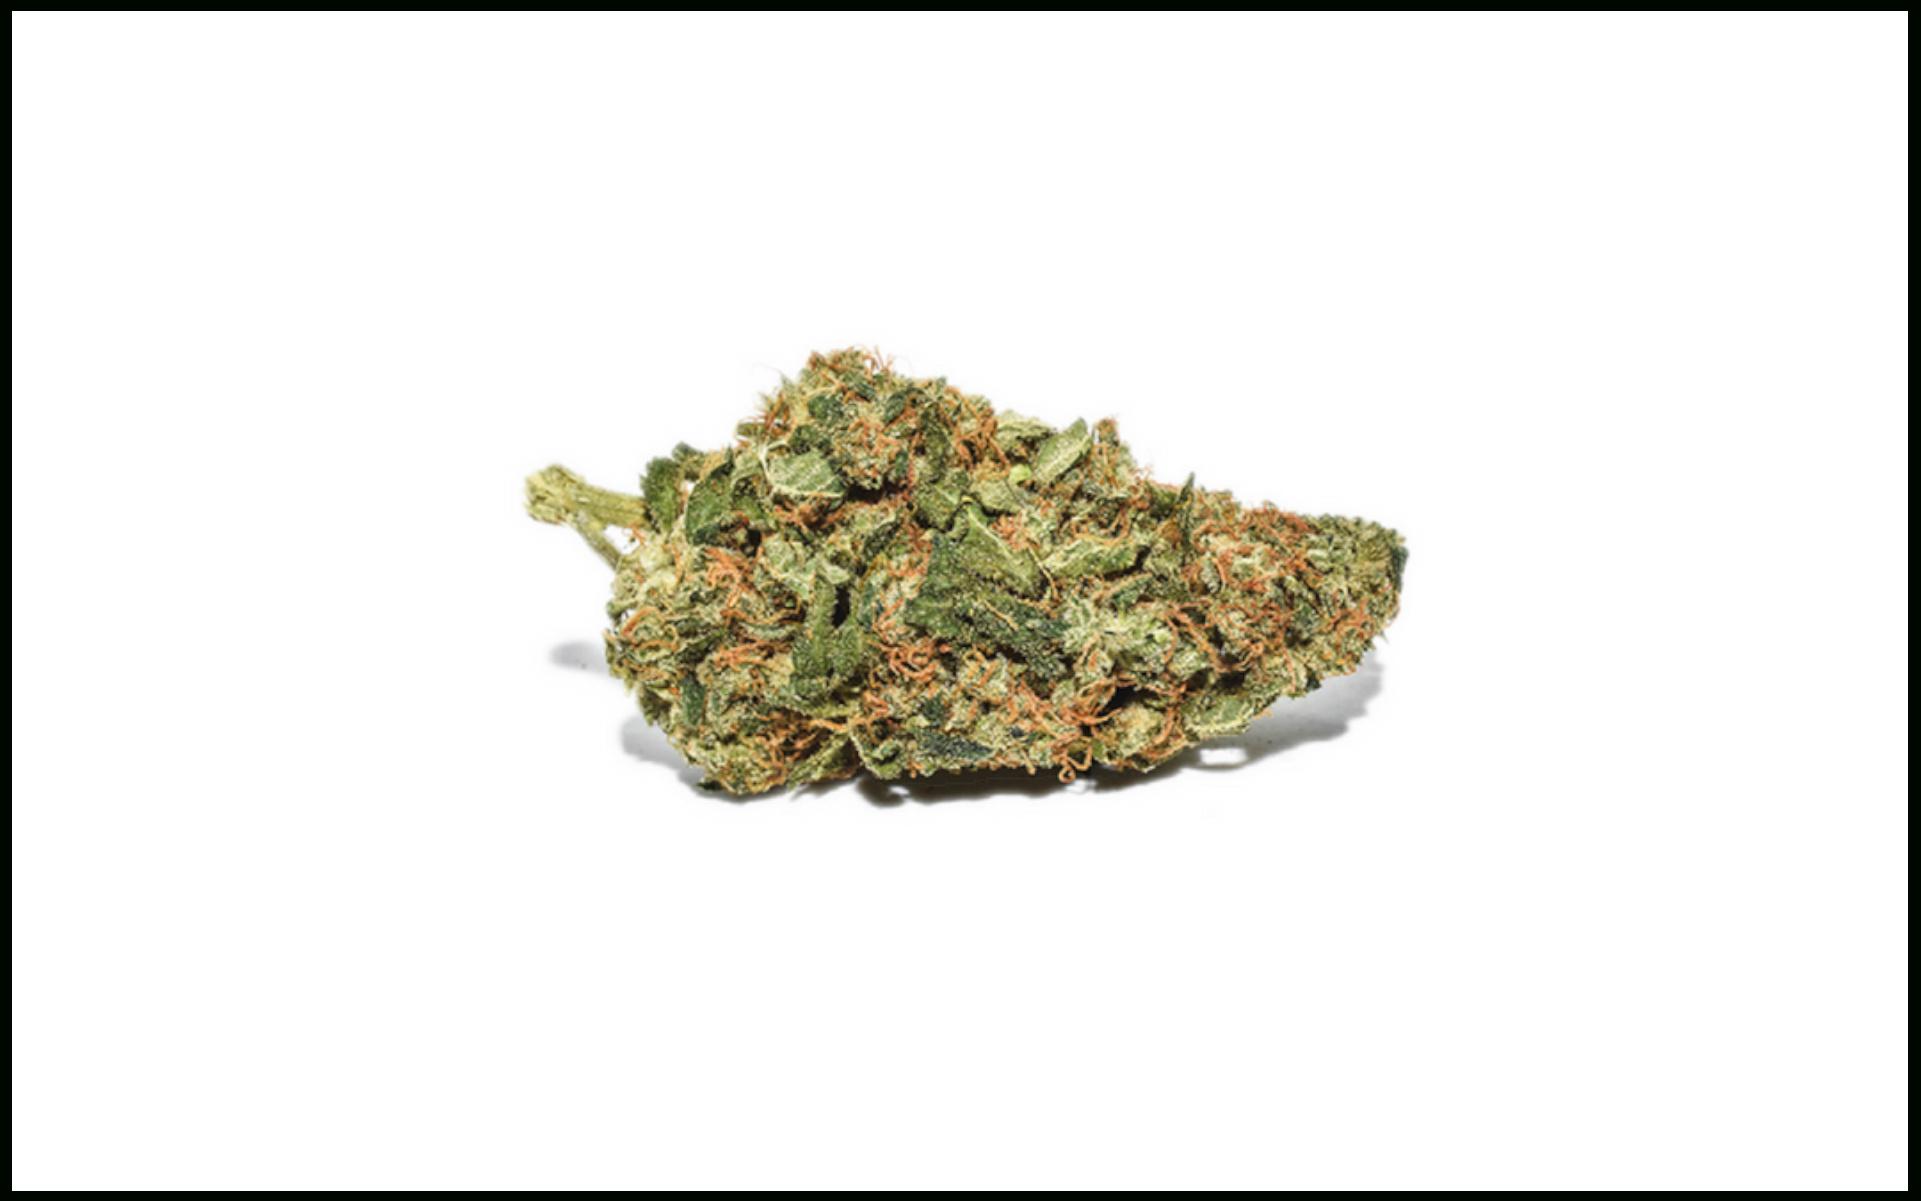 White Widow top marihuany